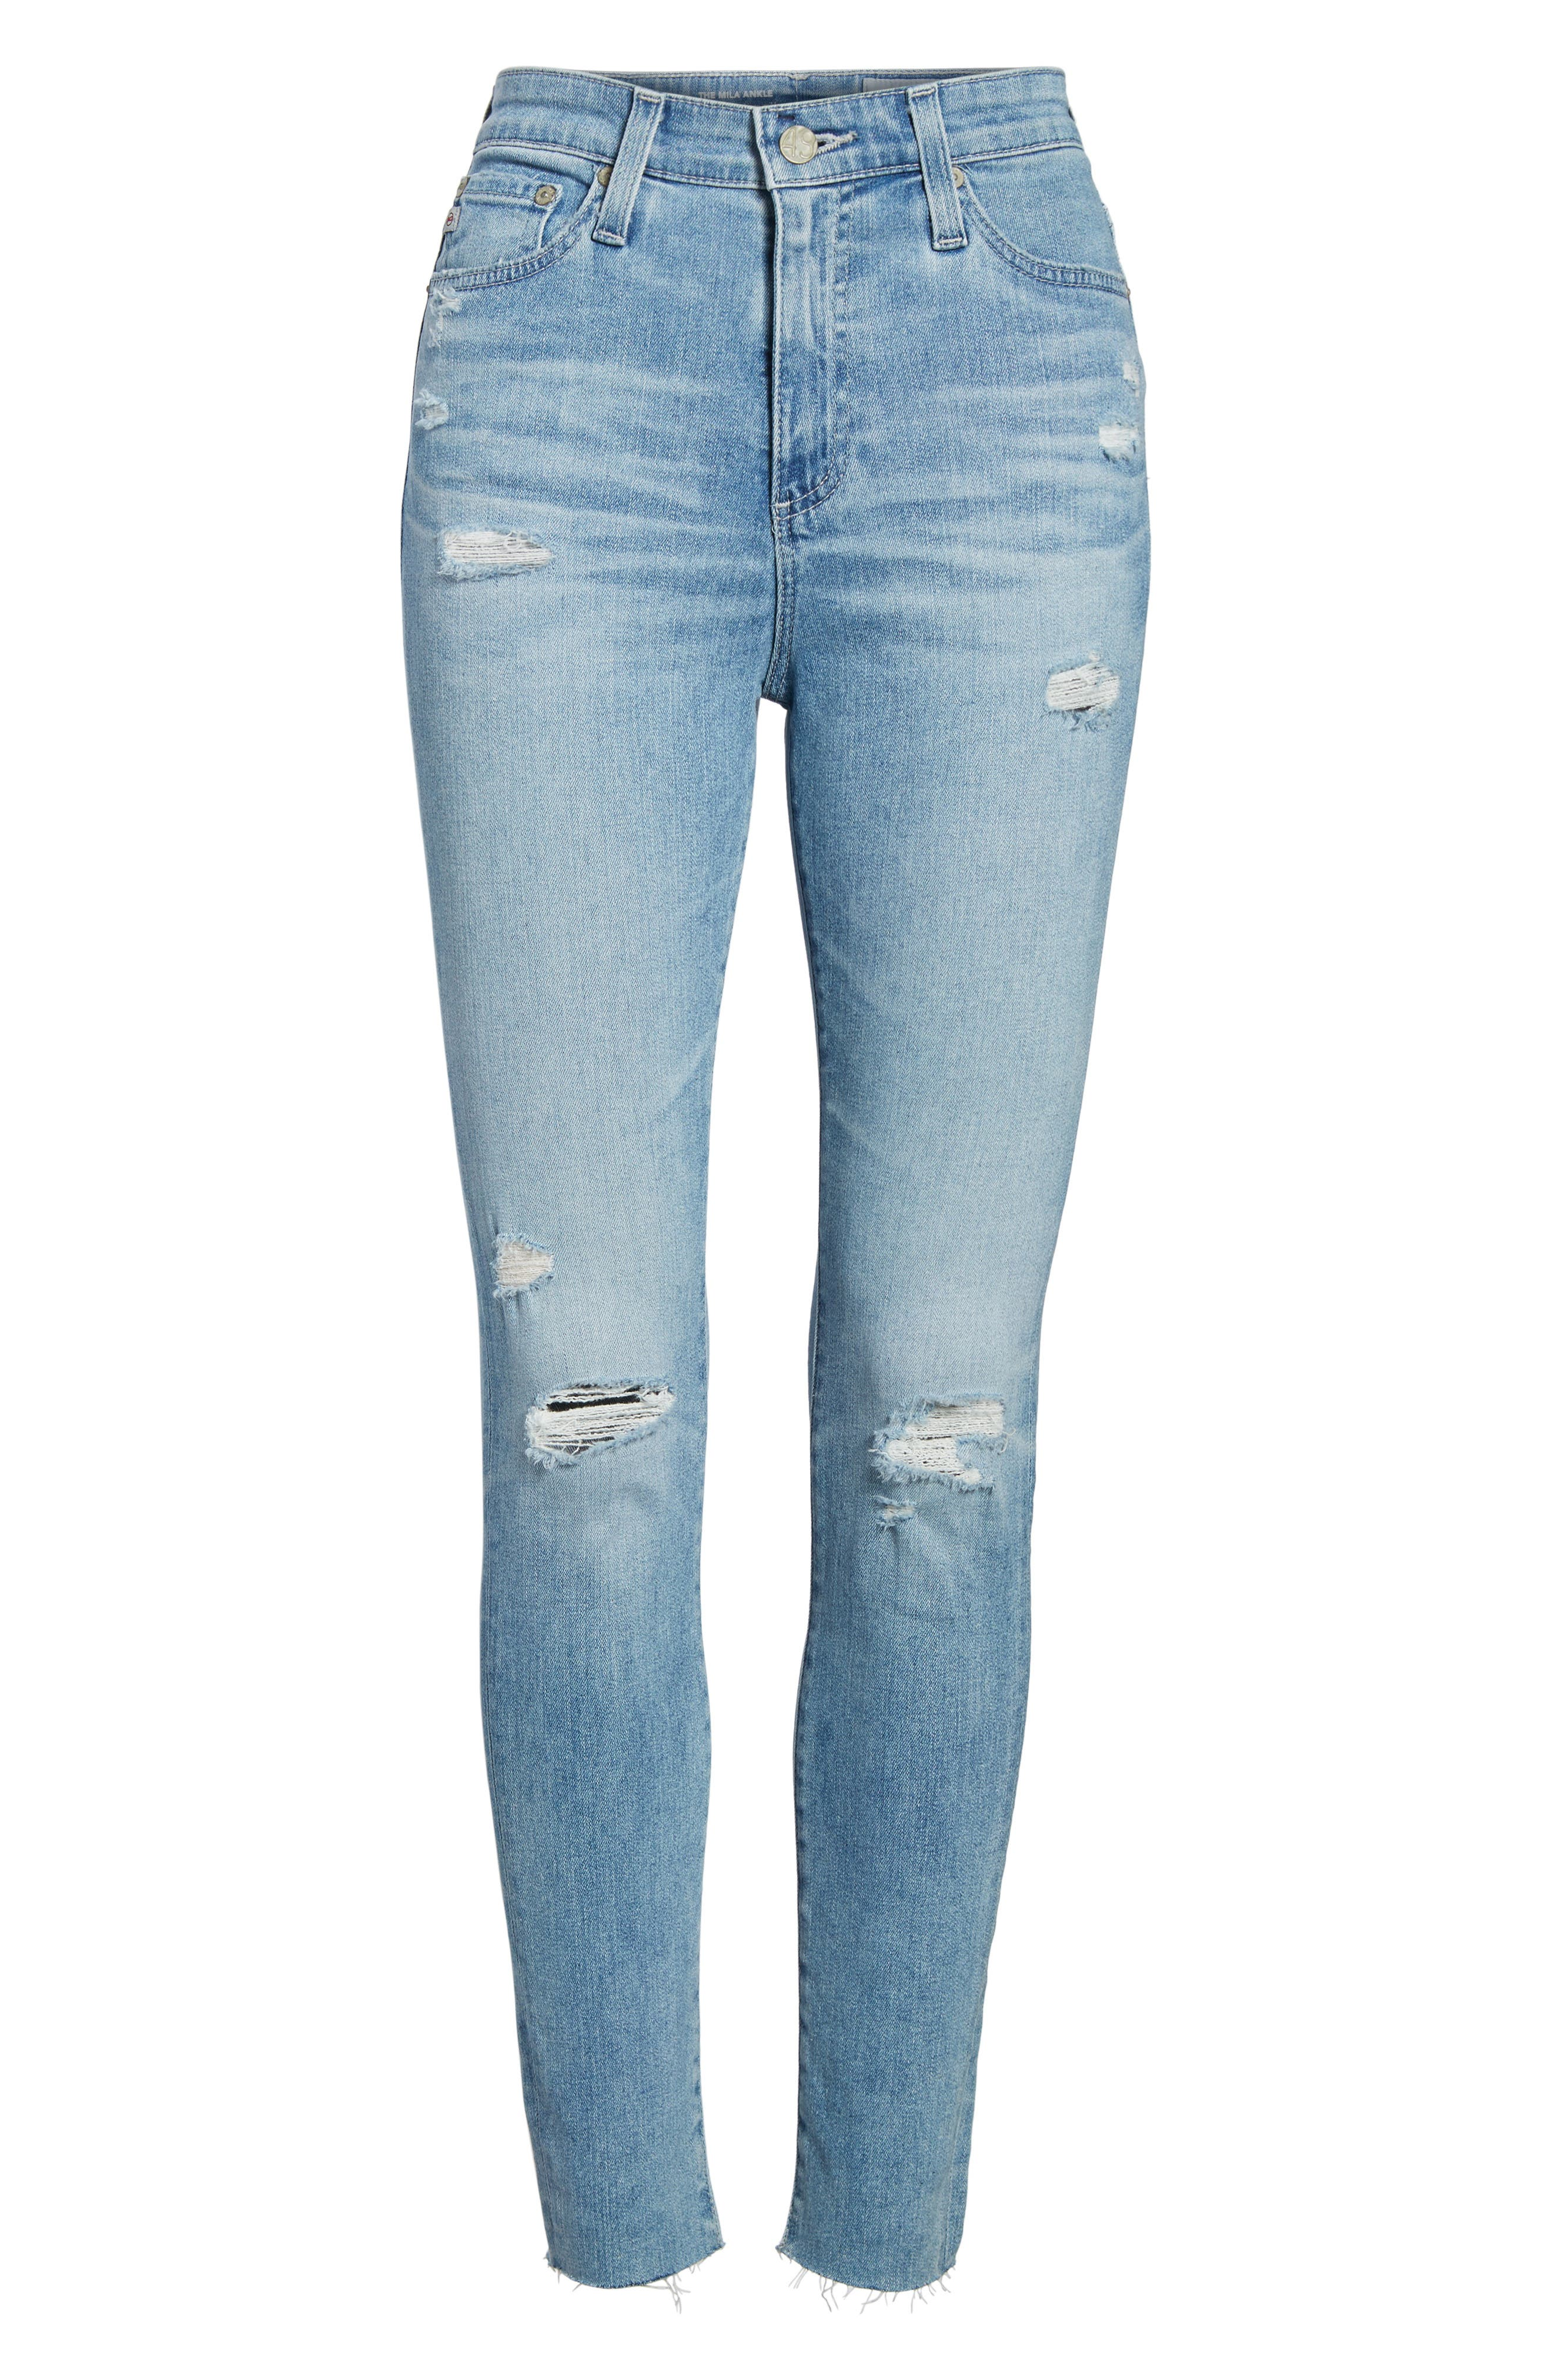 Mila High Waist Ankle Skinny Jeans,                             Alternate thumbnail 7, color,                             426